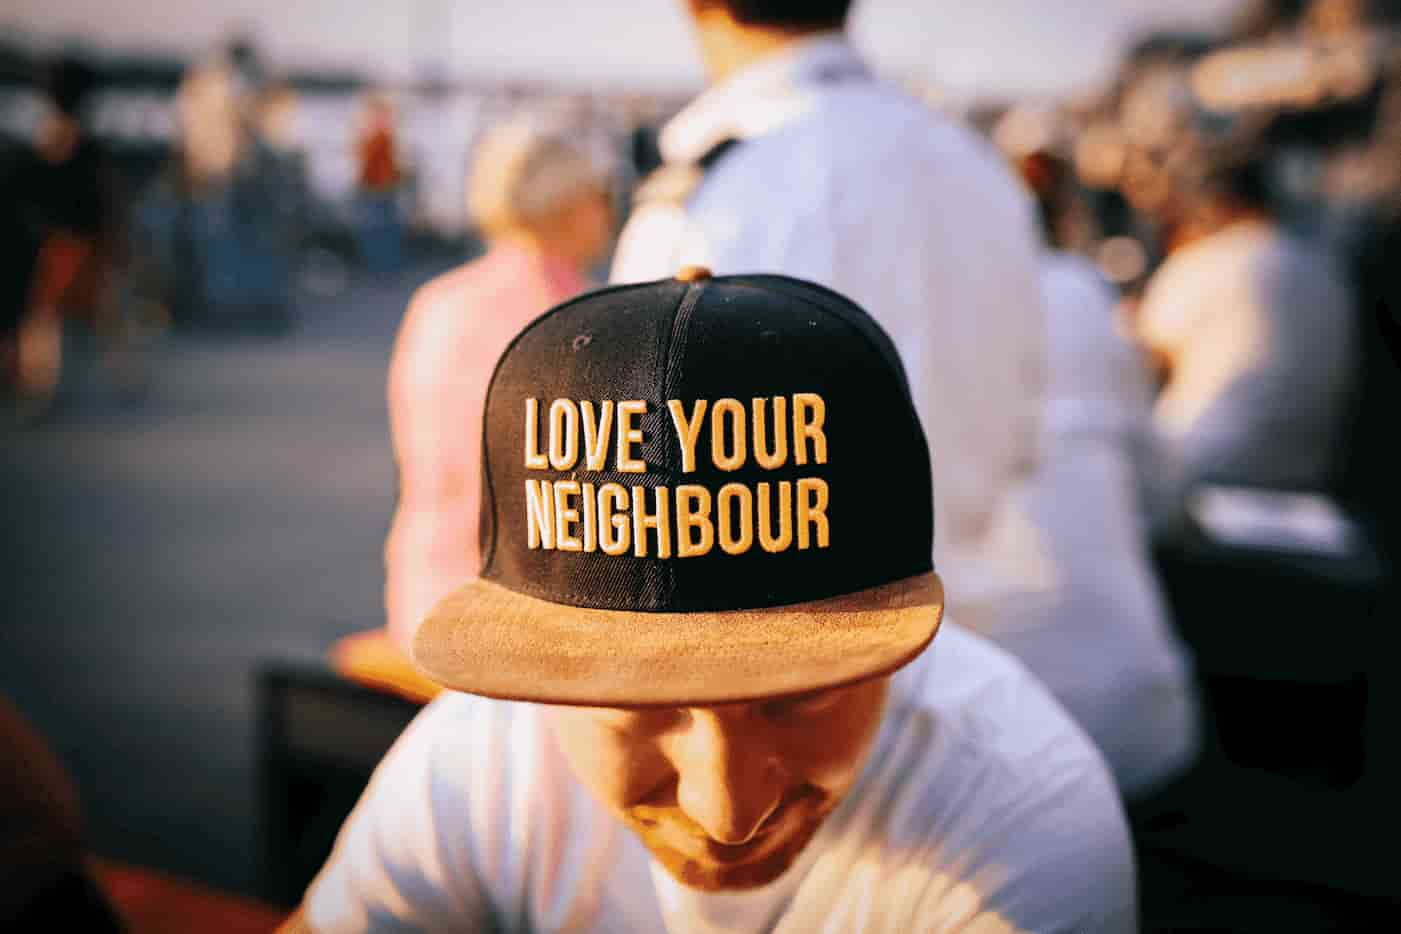 Keep a peaceful environment between neighbors